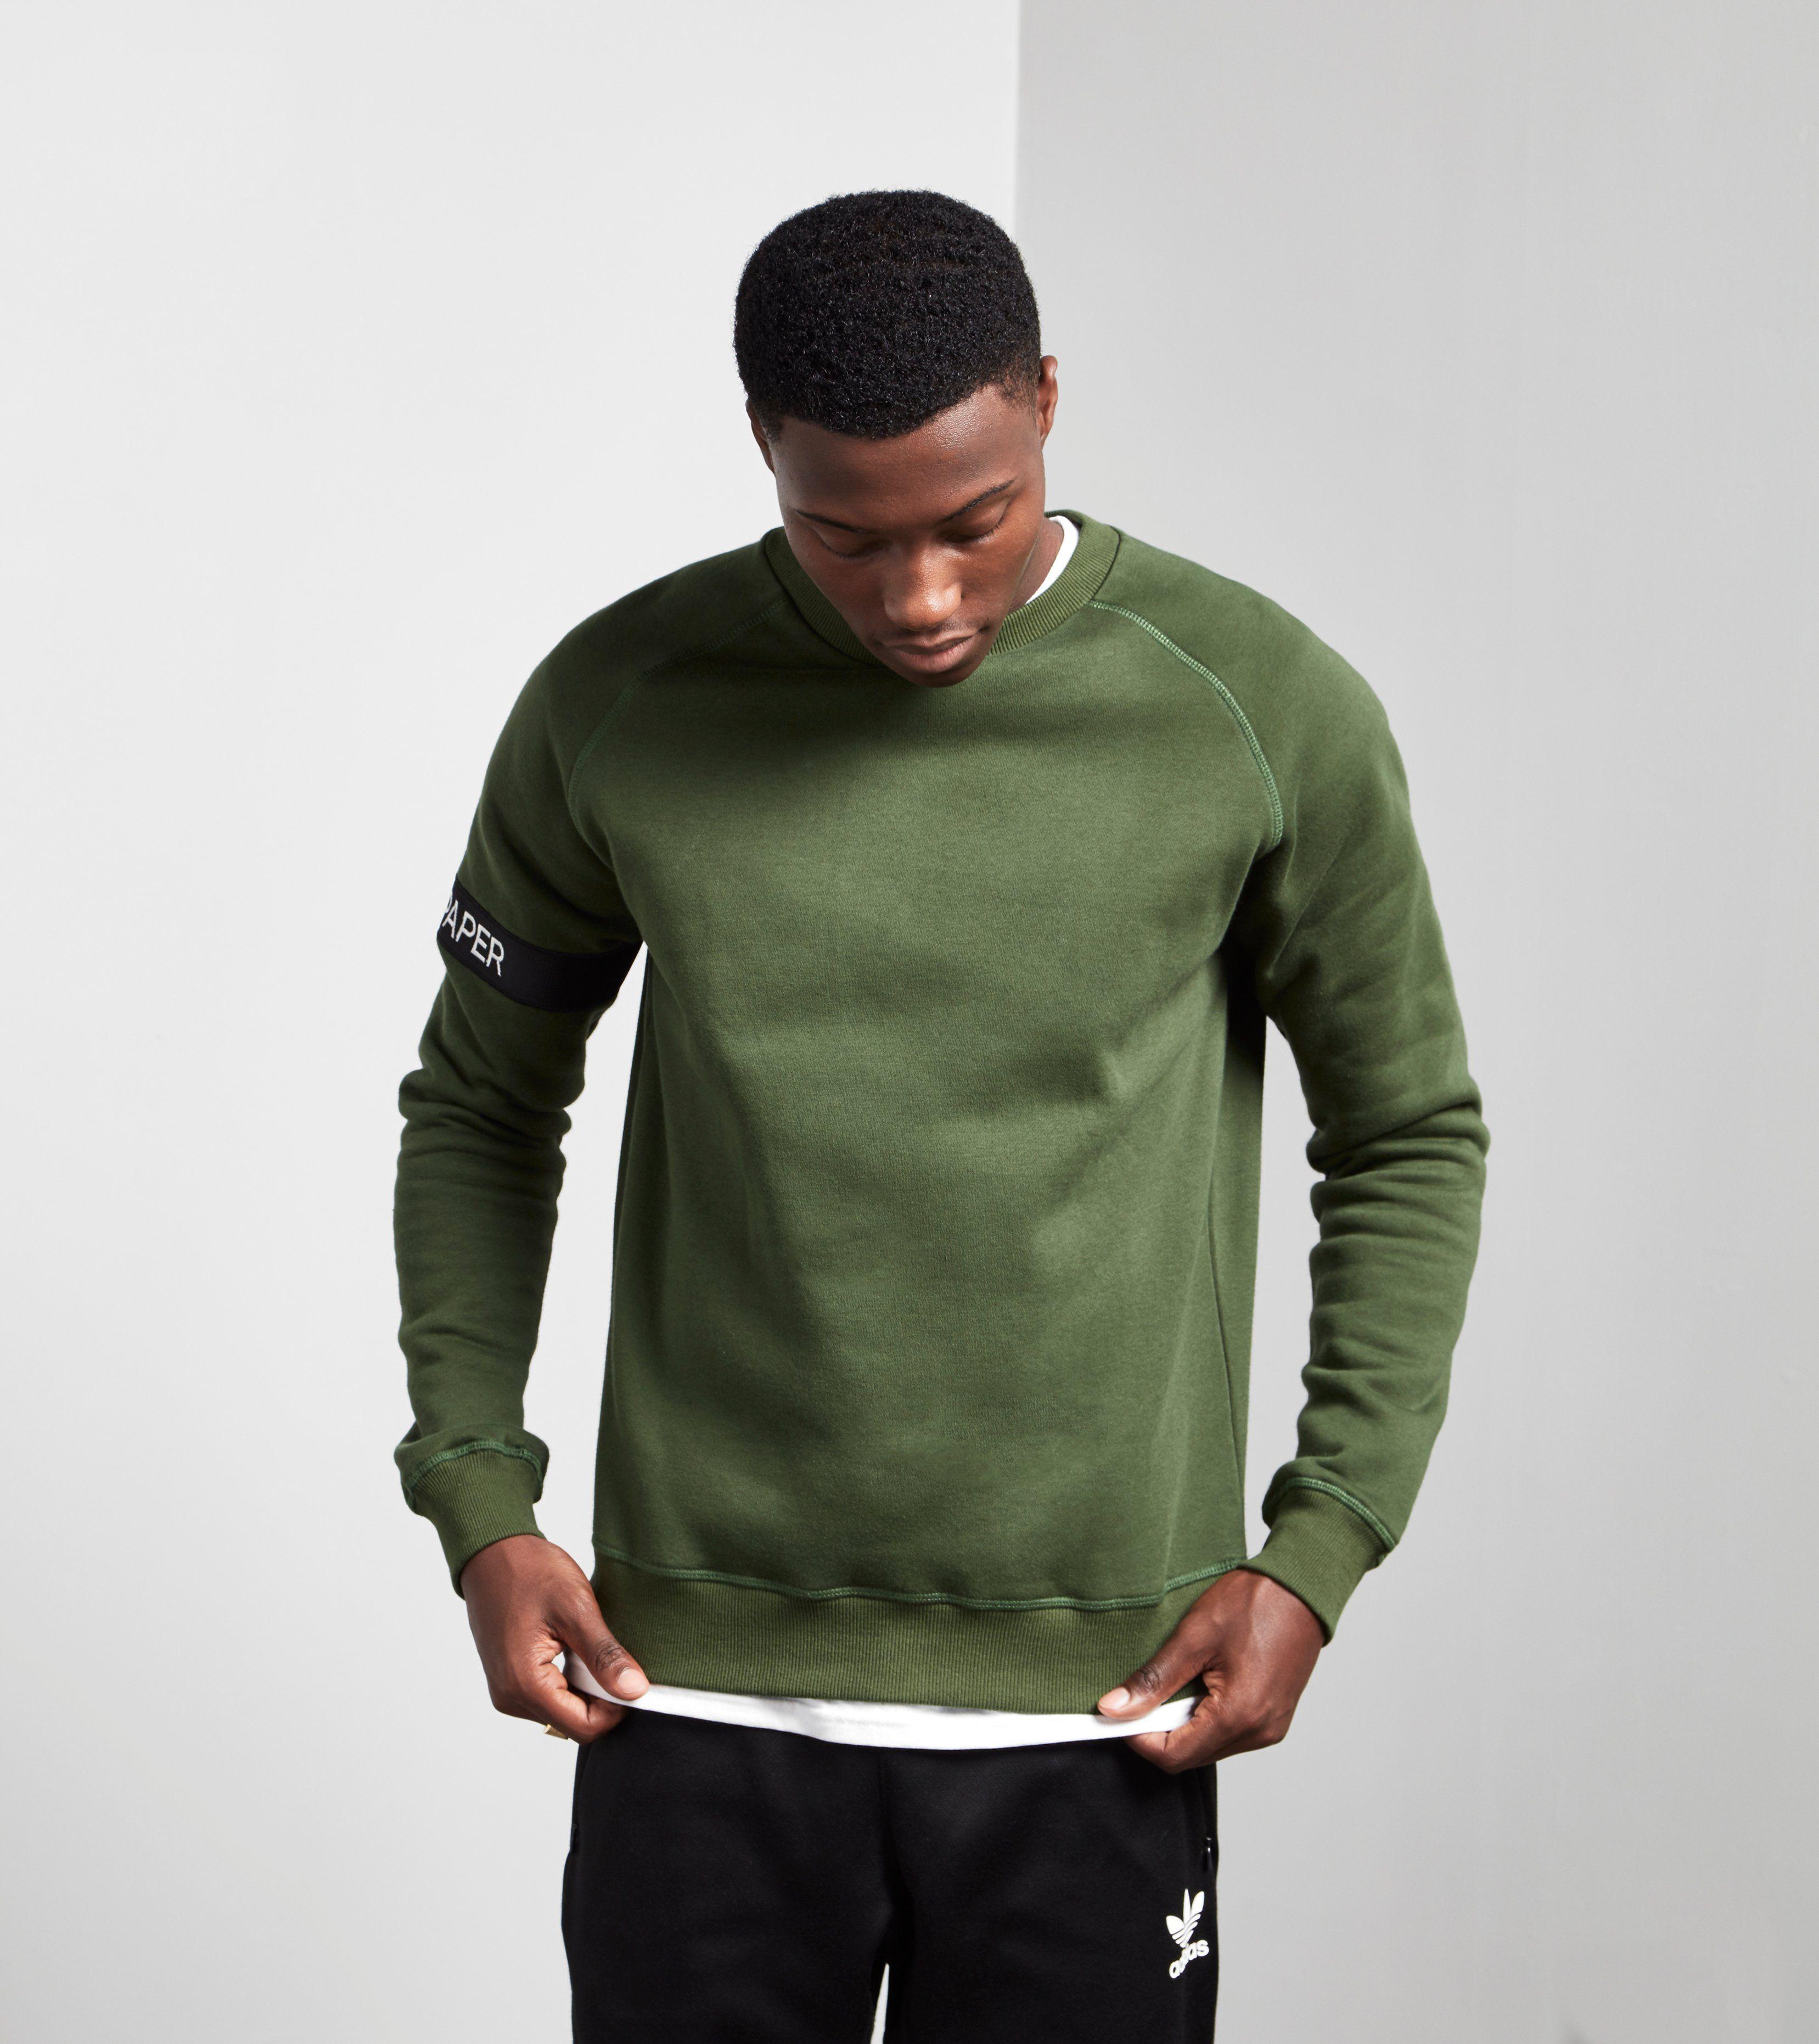 Nike Sweater Mens